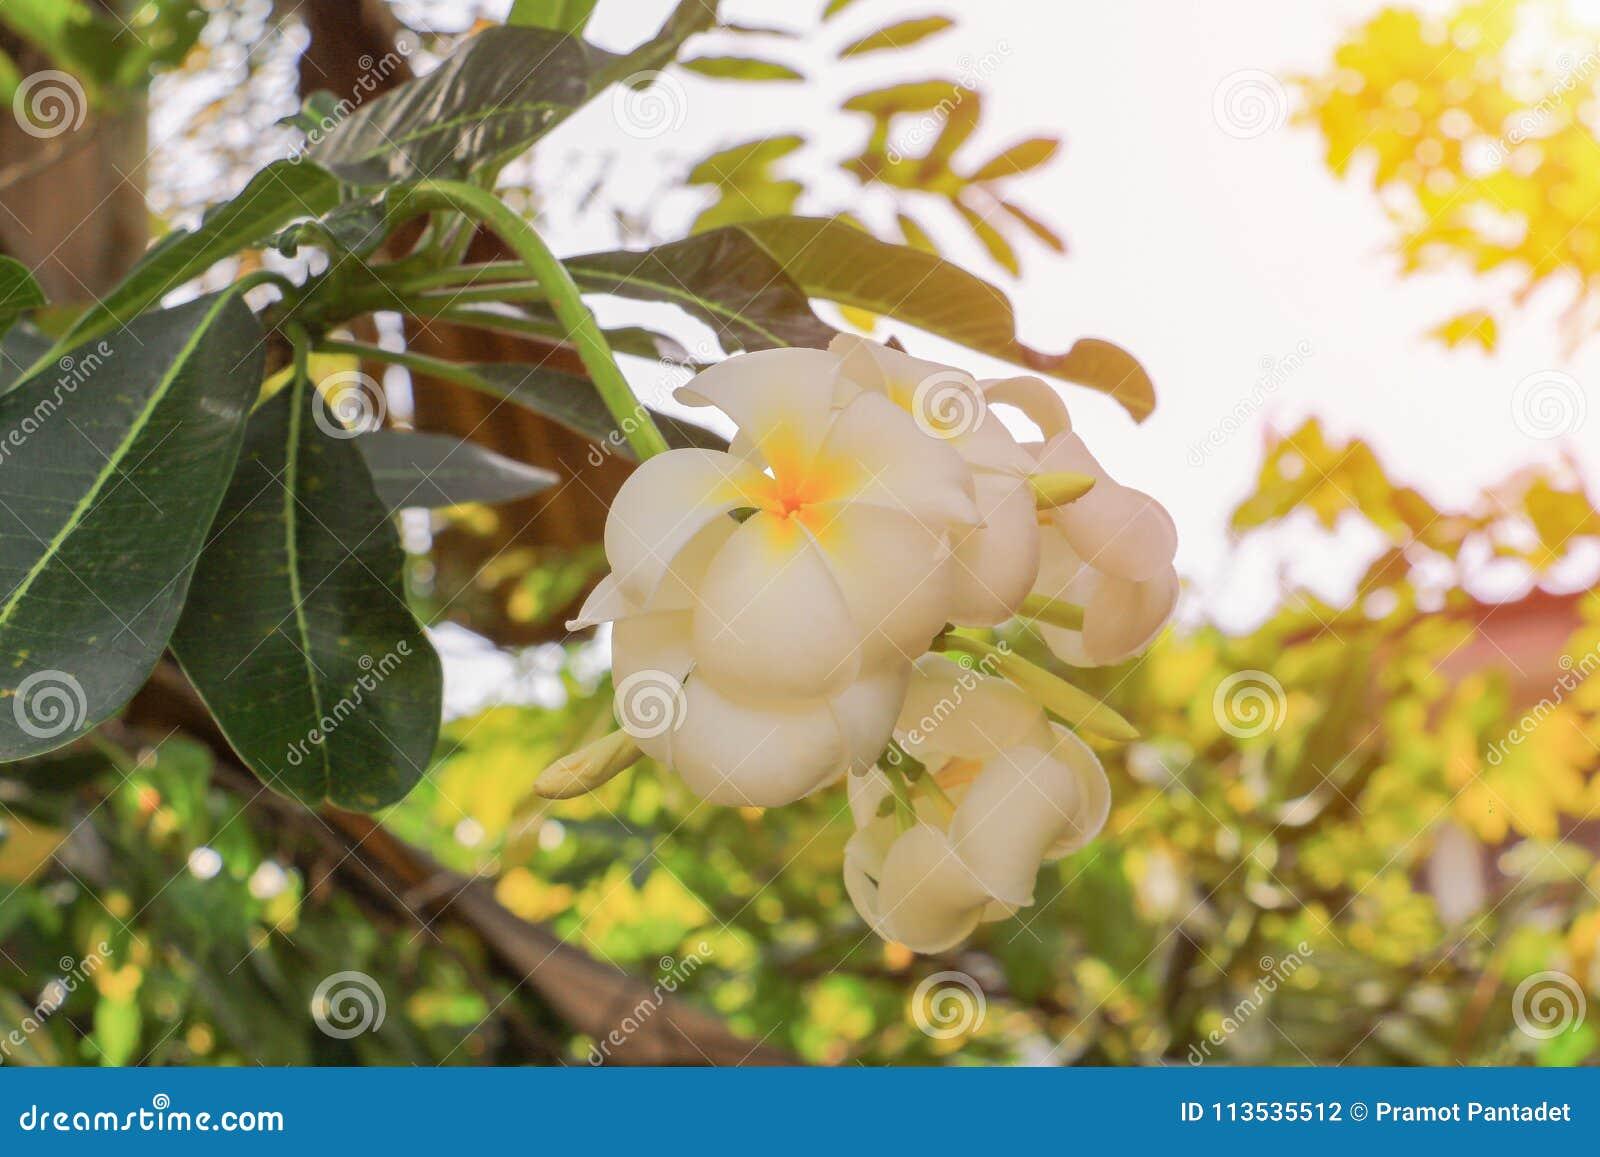 Plumeria Flower White Yellow Beautiful On Tree With Sunset Light